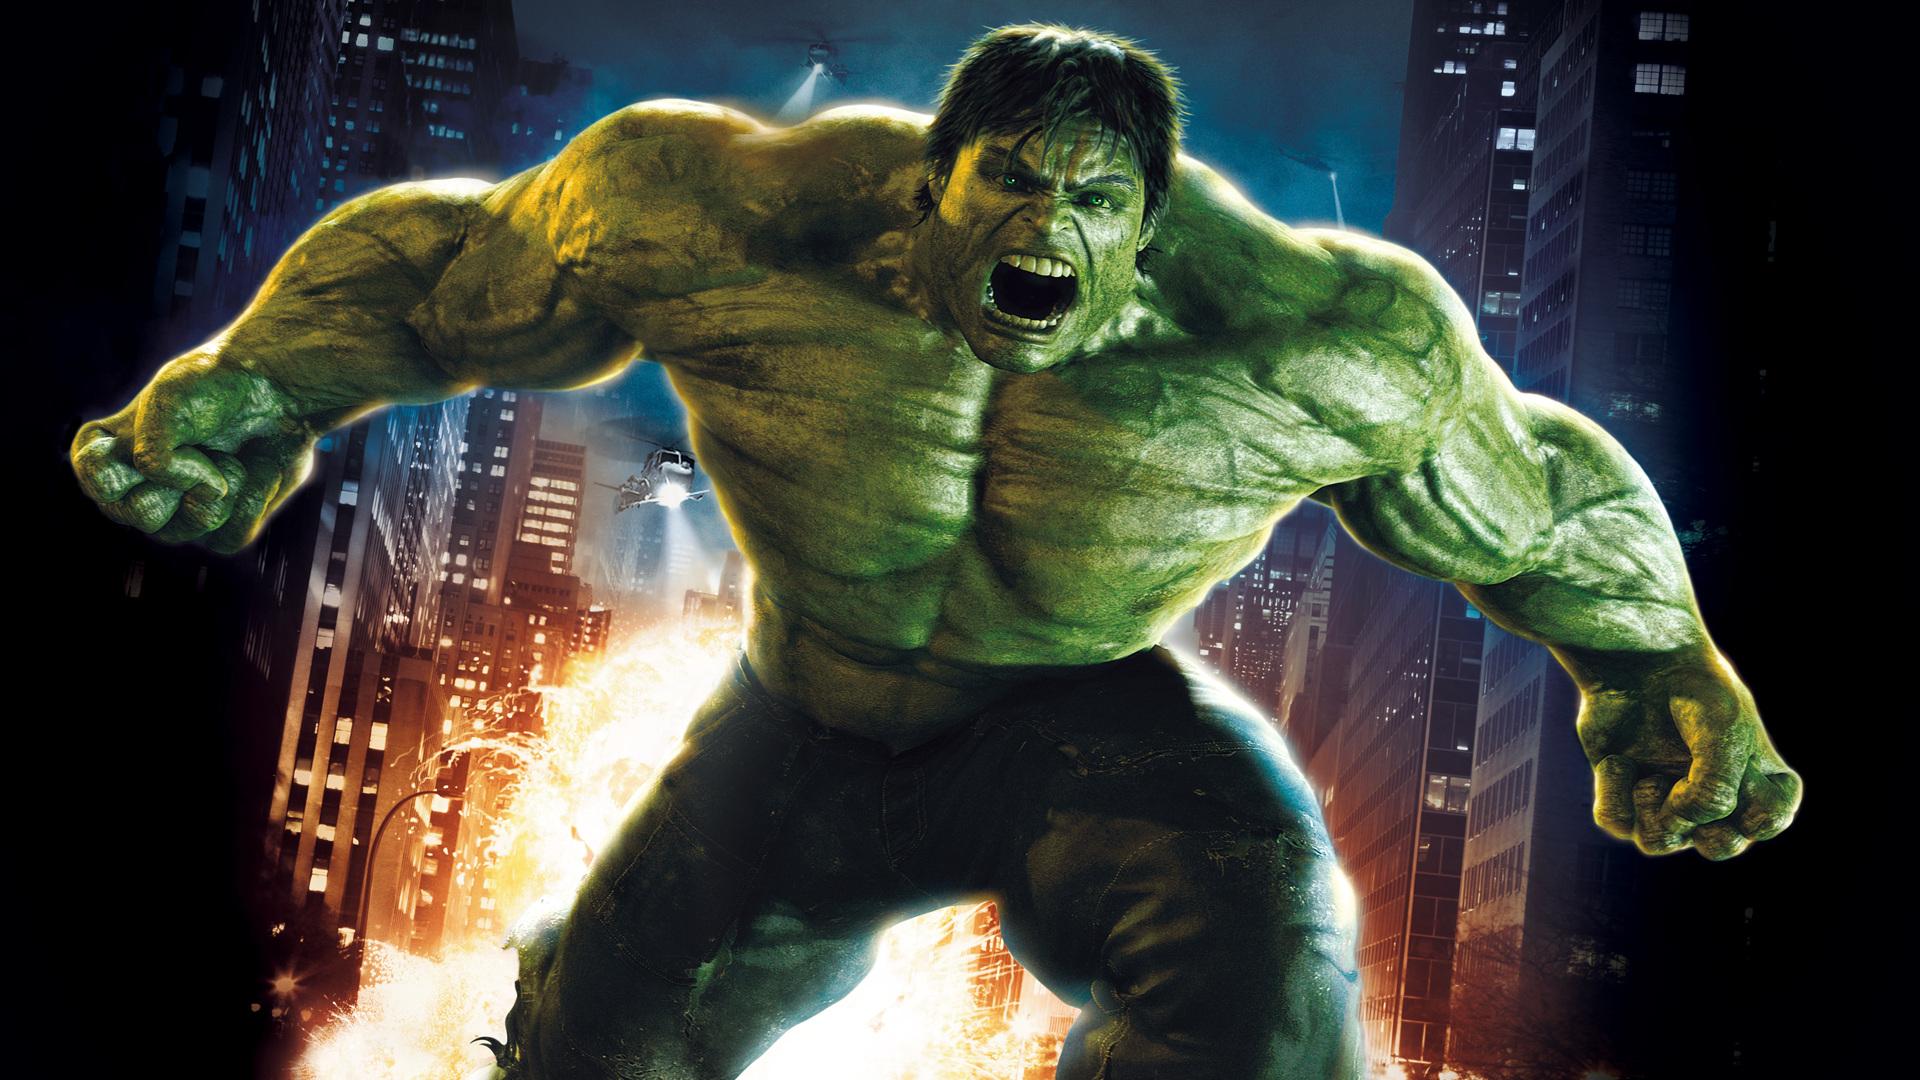 The Incredible Hulk Fanart 1920x1080